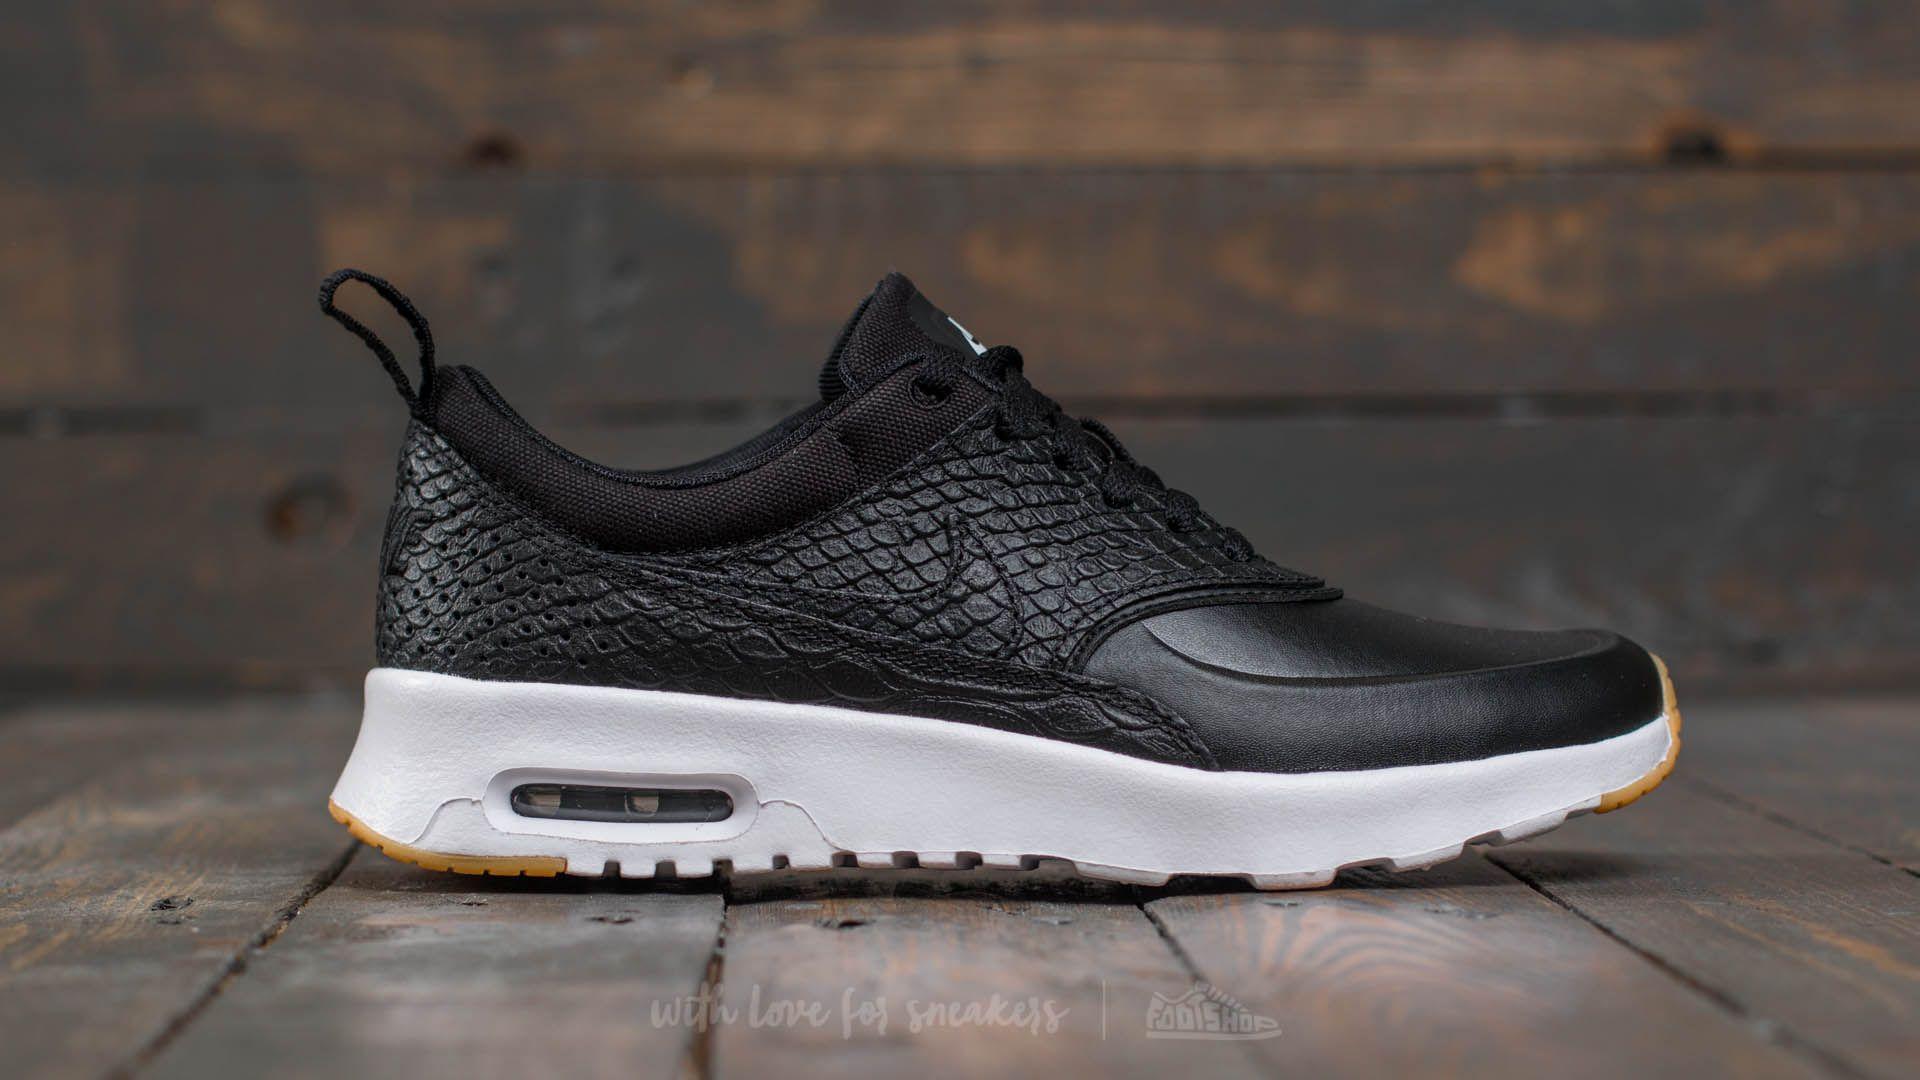 Nike Wmns Air Max Thea Premium Black Black Gum Yellow White